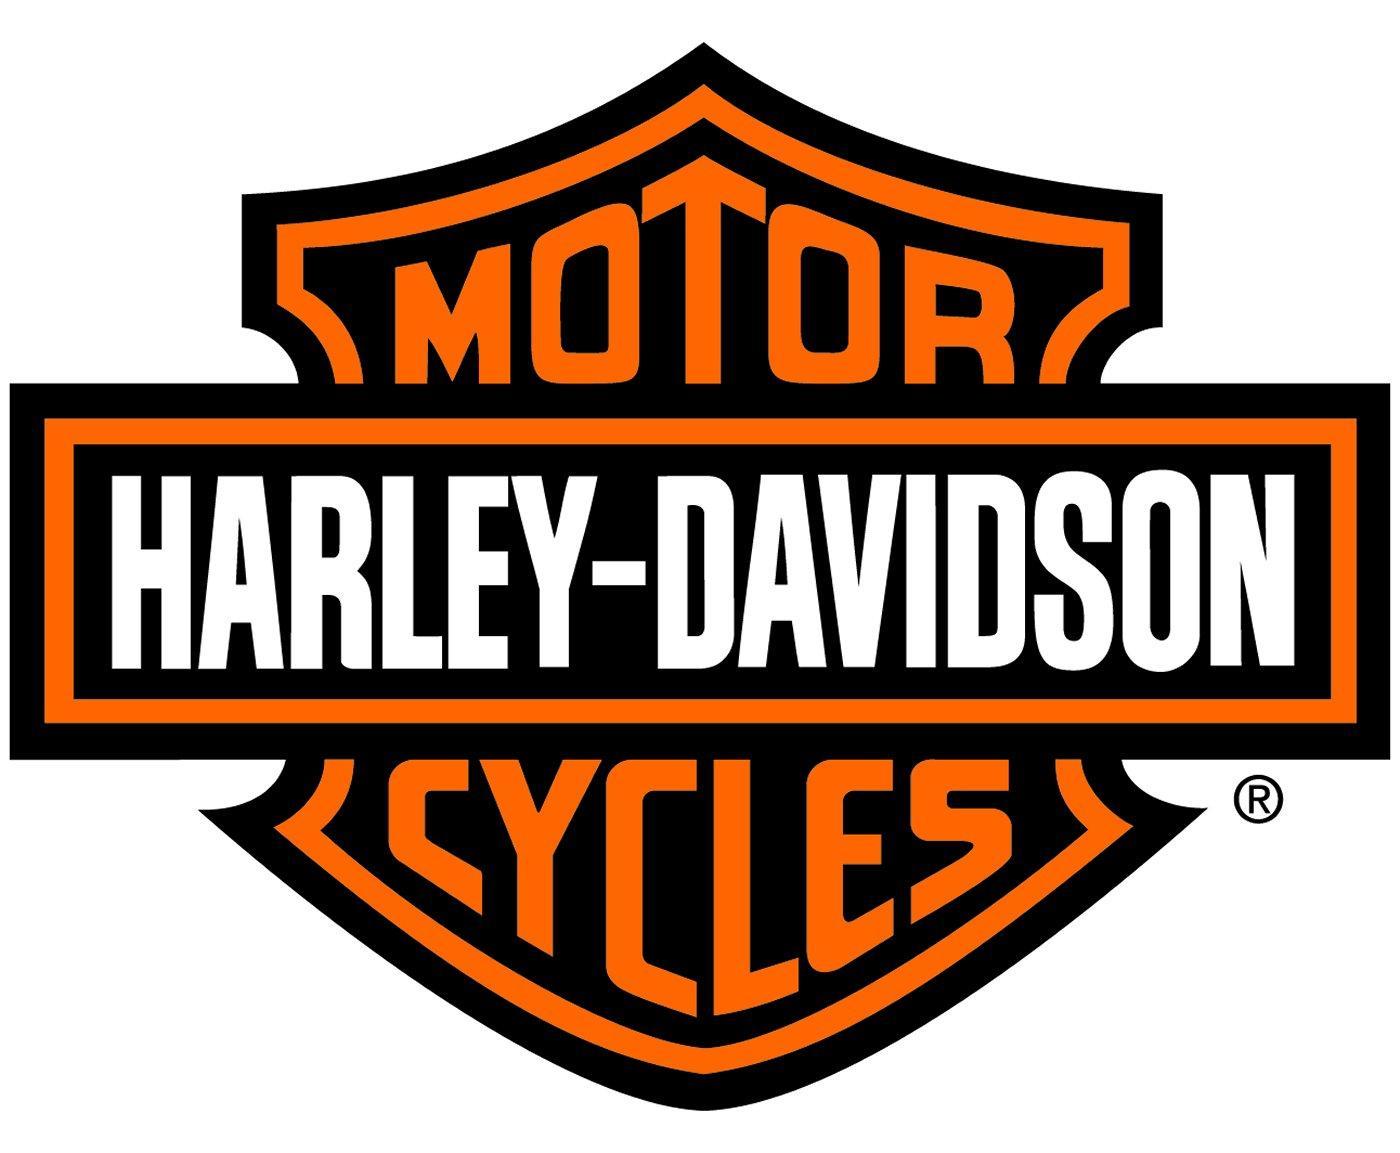 Harley Davidson No Reason To Get Onboard Harley Davidson Inc